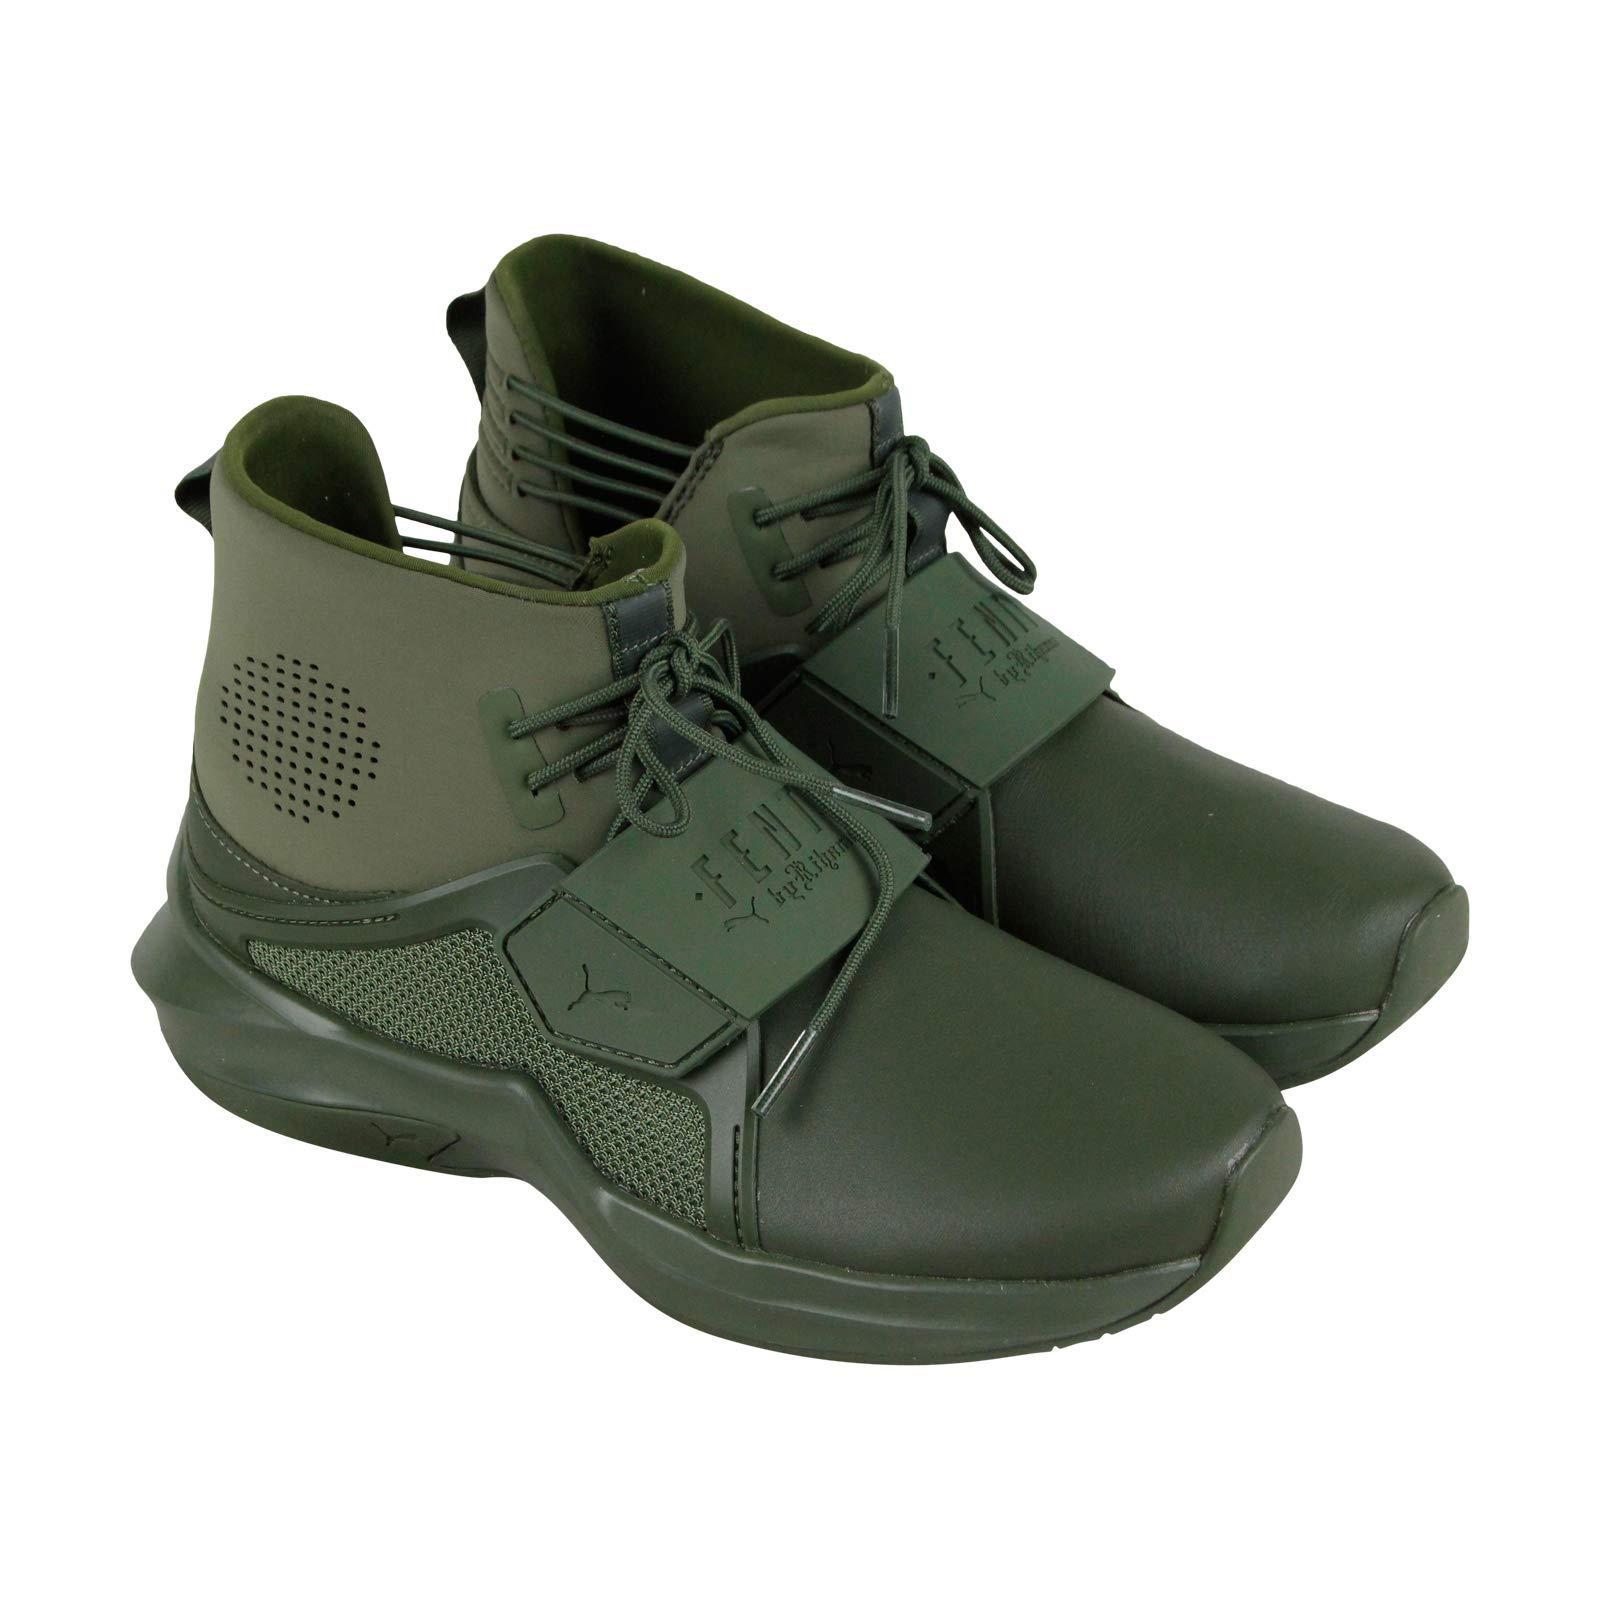 PUMA Women's Fenty X High Top Trainer Sneakers, Cypress, 5.5 B(M) US